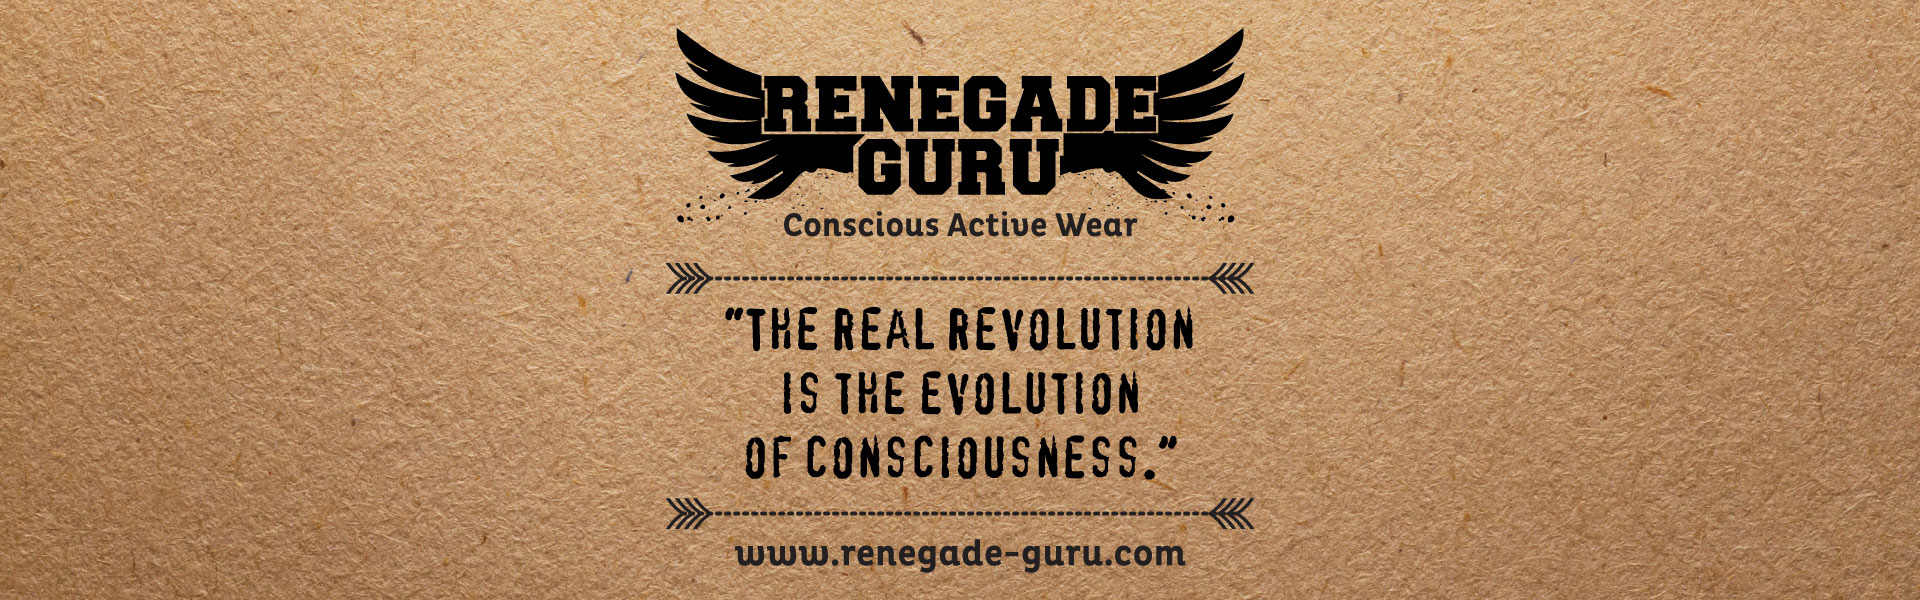 Renegade Guru heren yoga kleding